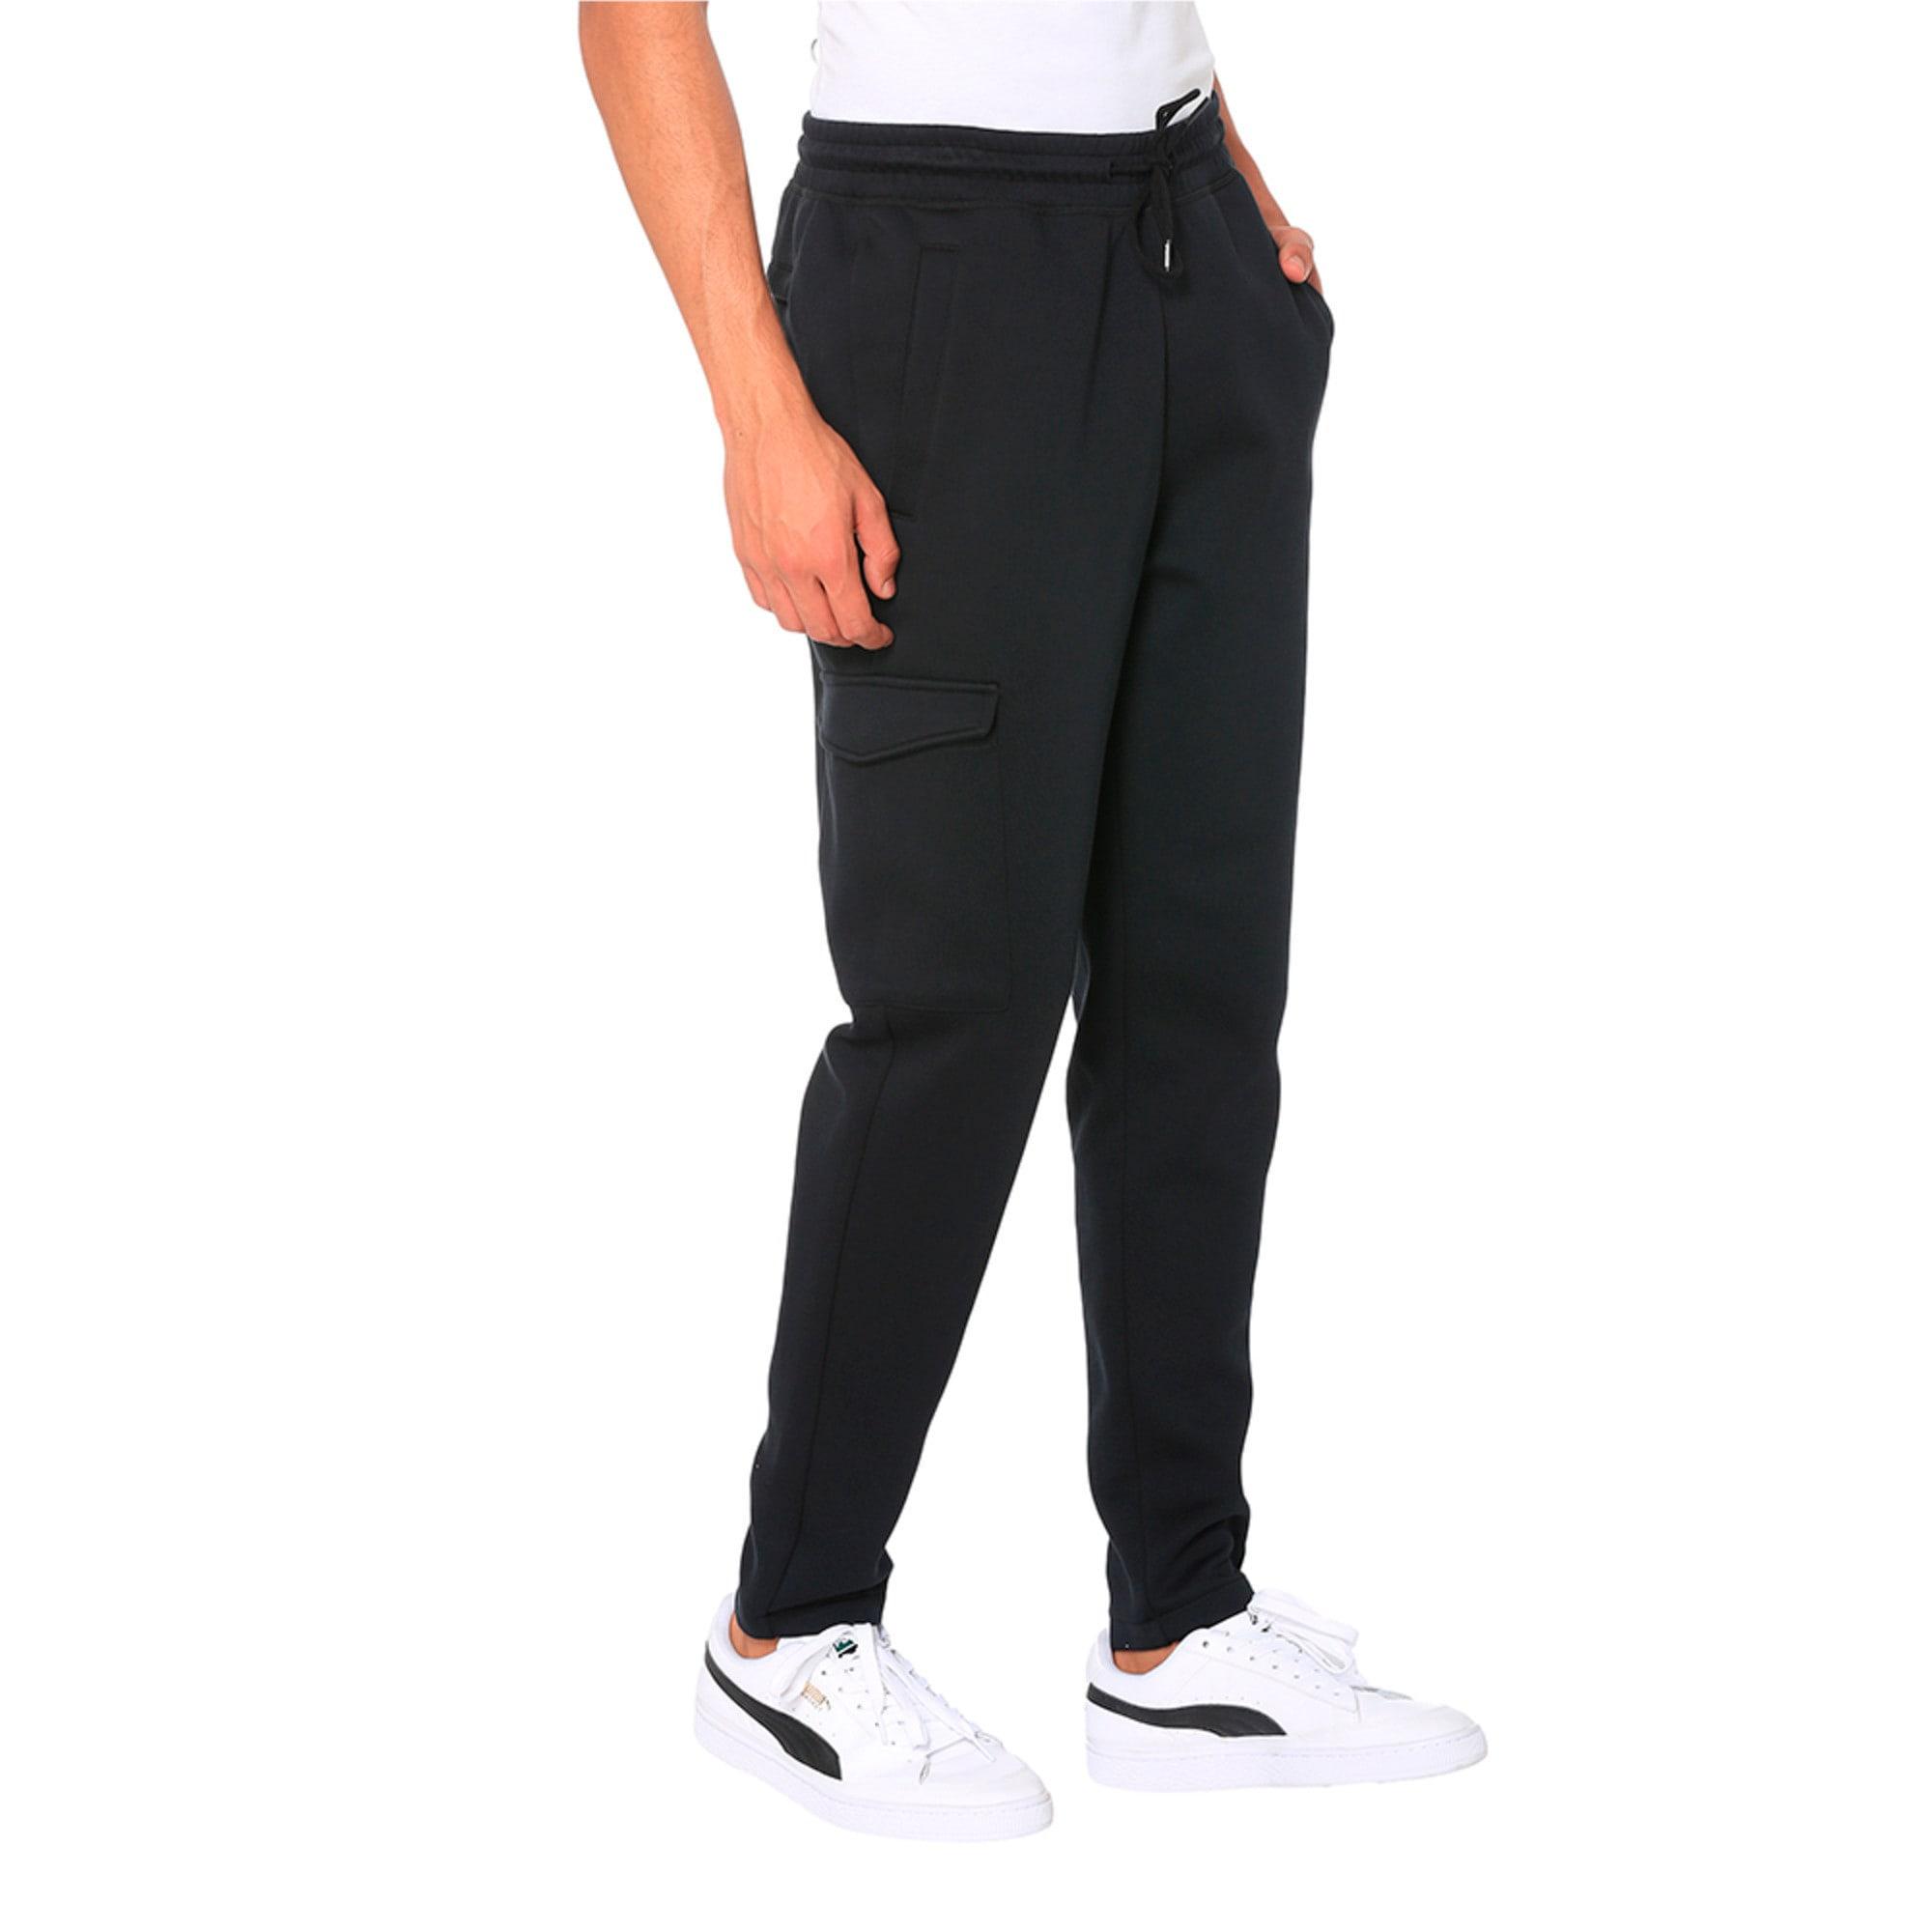 Thumbnail 2 of Classics Pocket Pants OH, Cotton Black, medium-IND